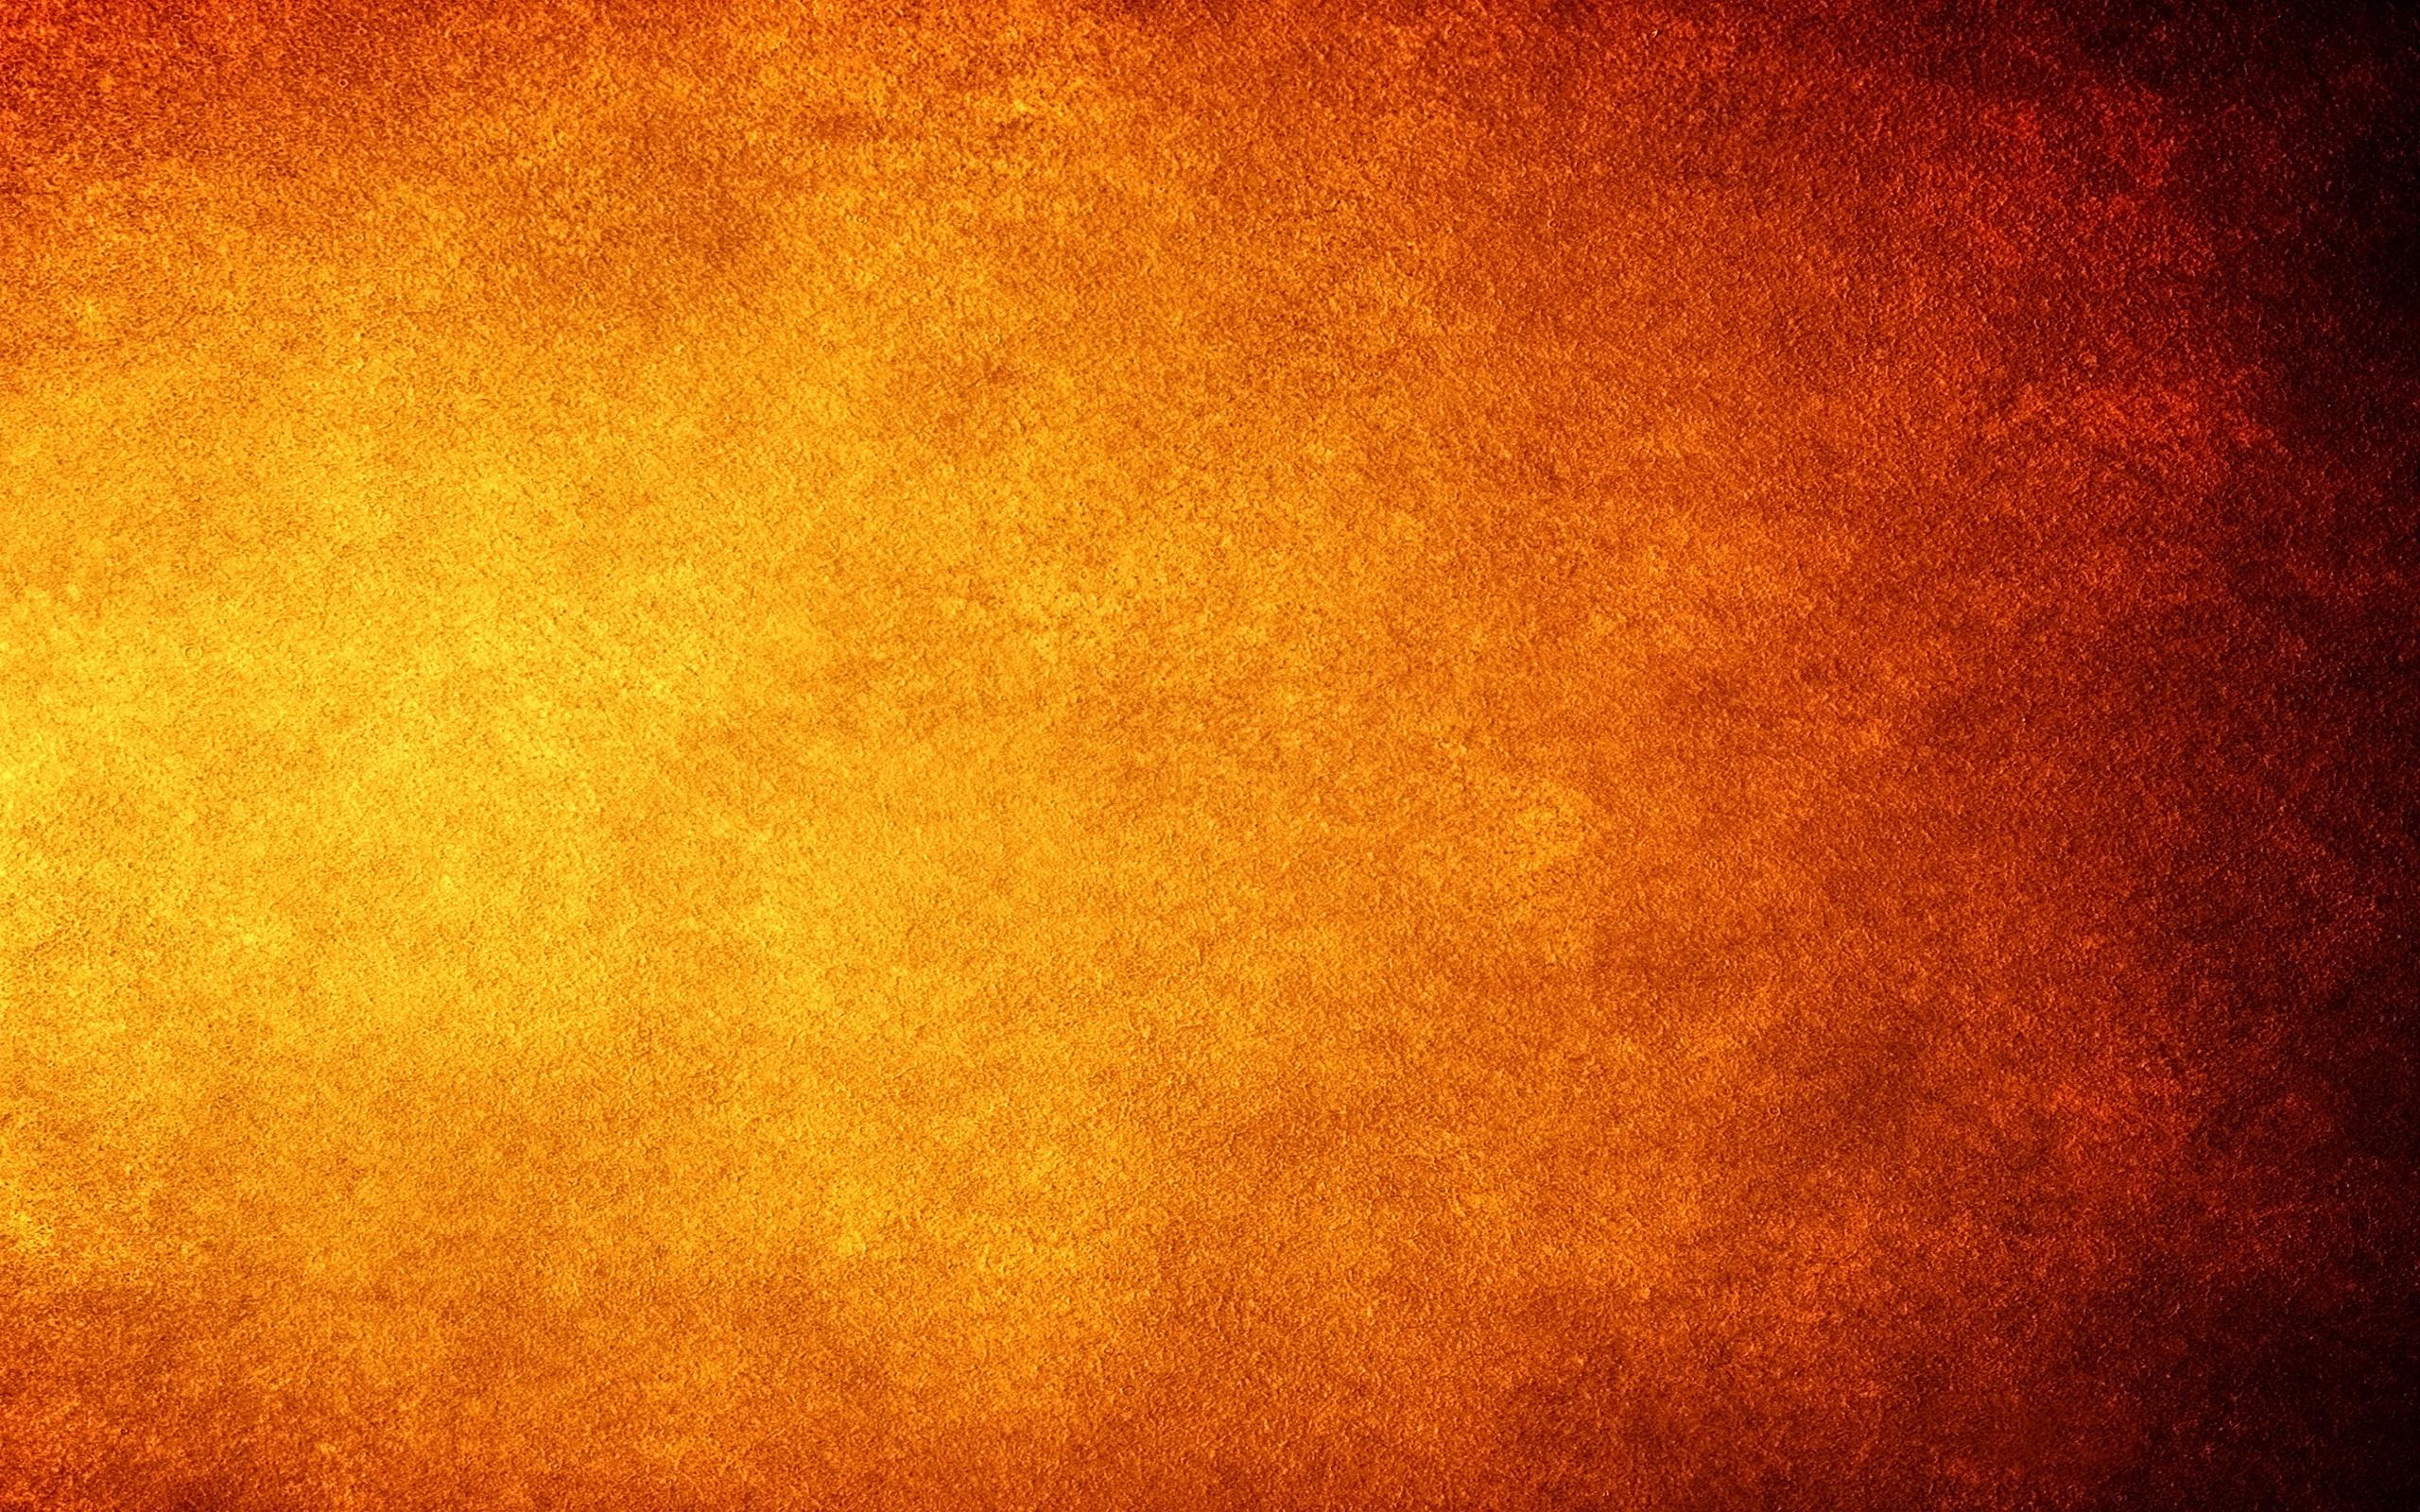 wpid-Orange-Red-Wallpaper.jpg